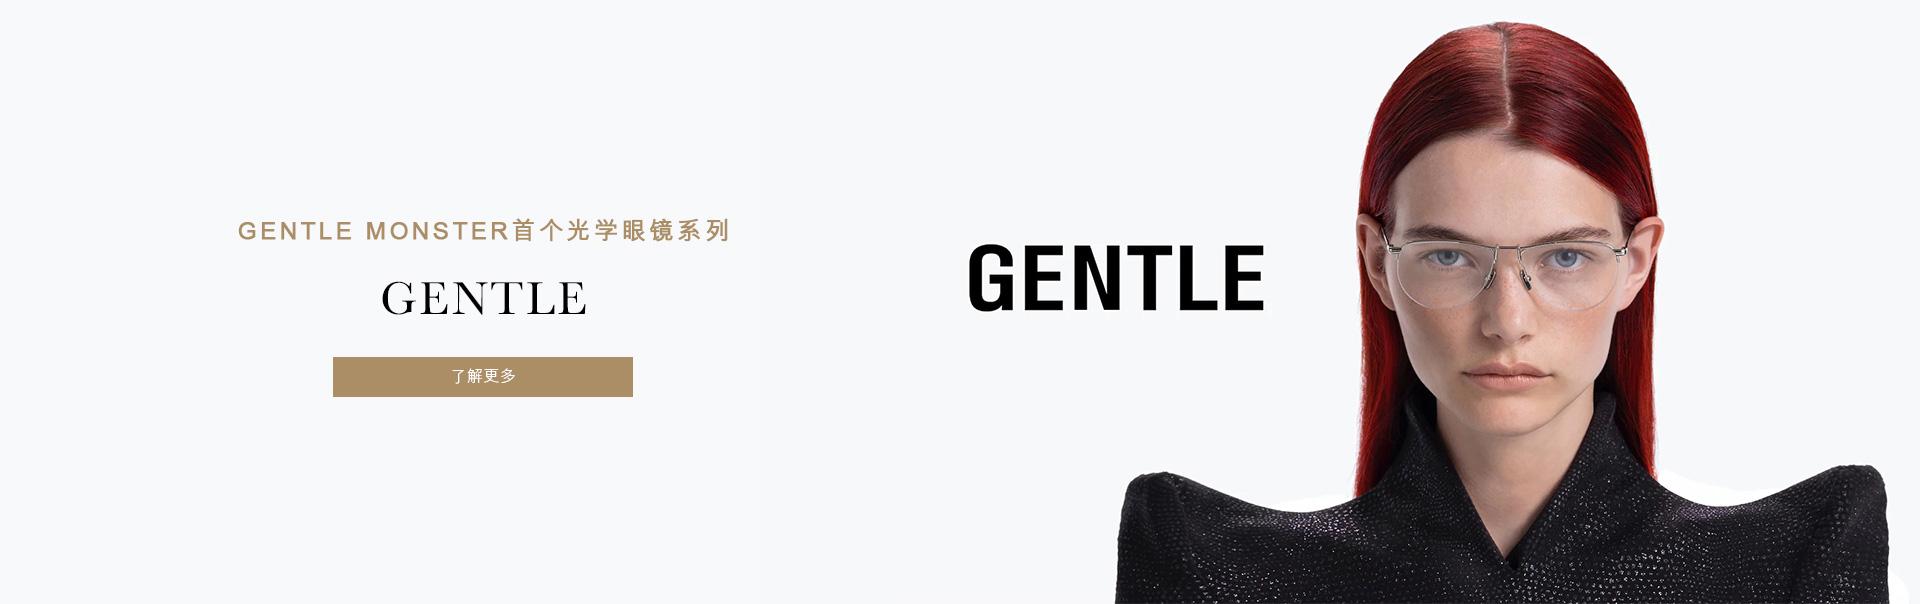 GENTLE MONSTER 全新光学眼镜系列 GENTLE